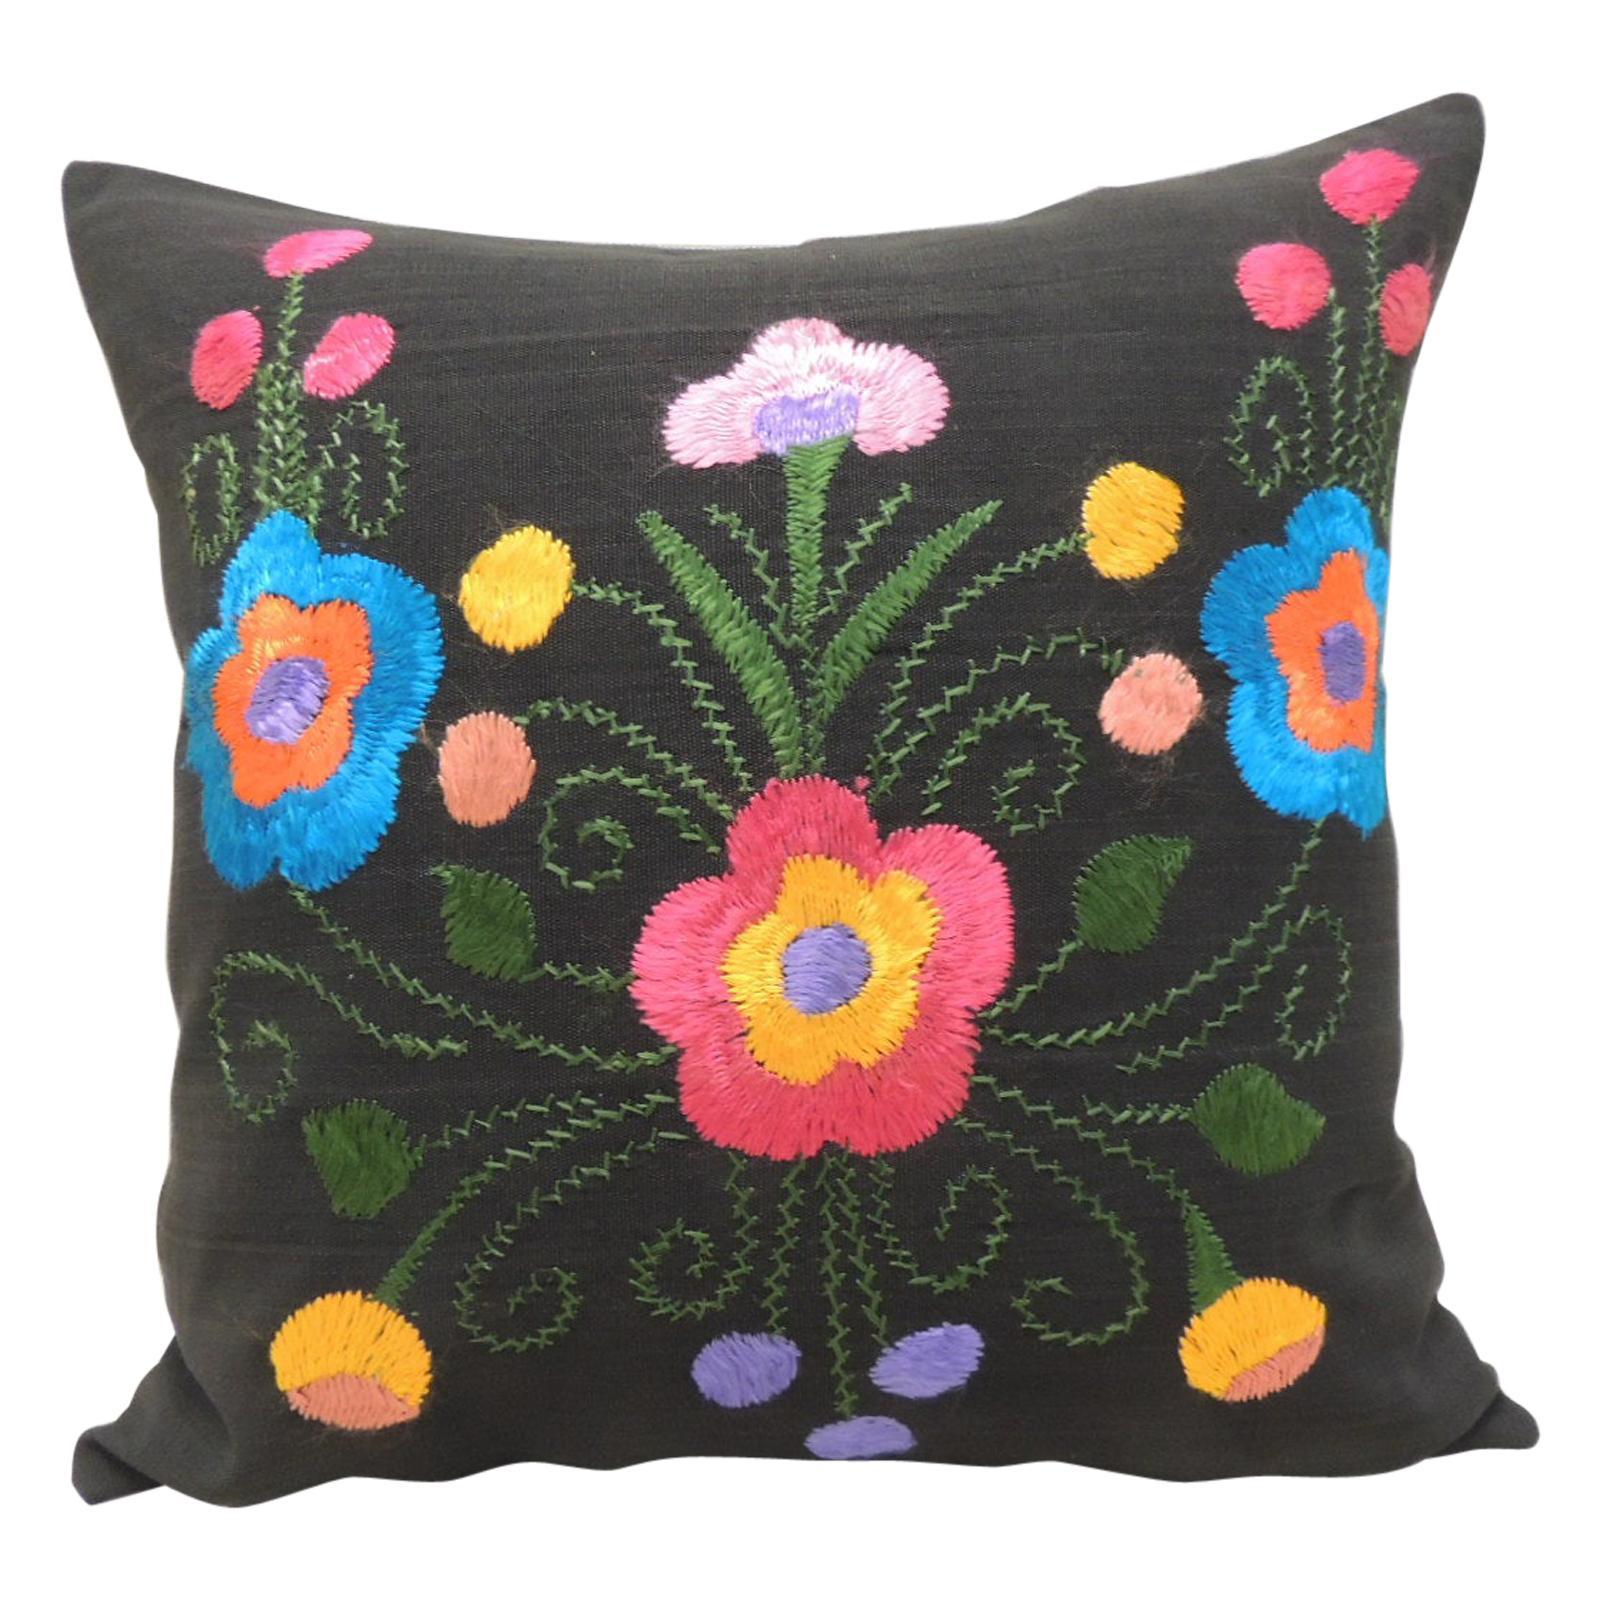 Blue and Orange Square Decorative Pillow